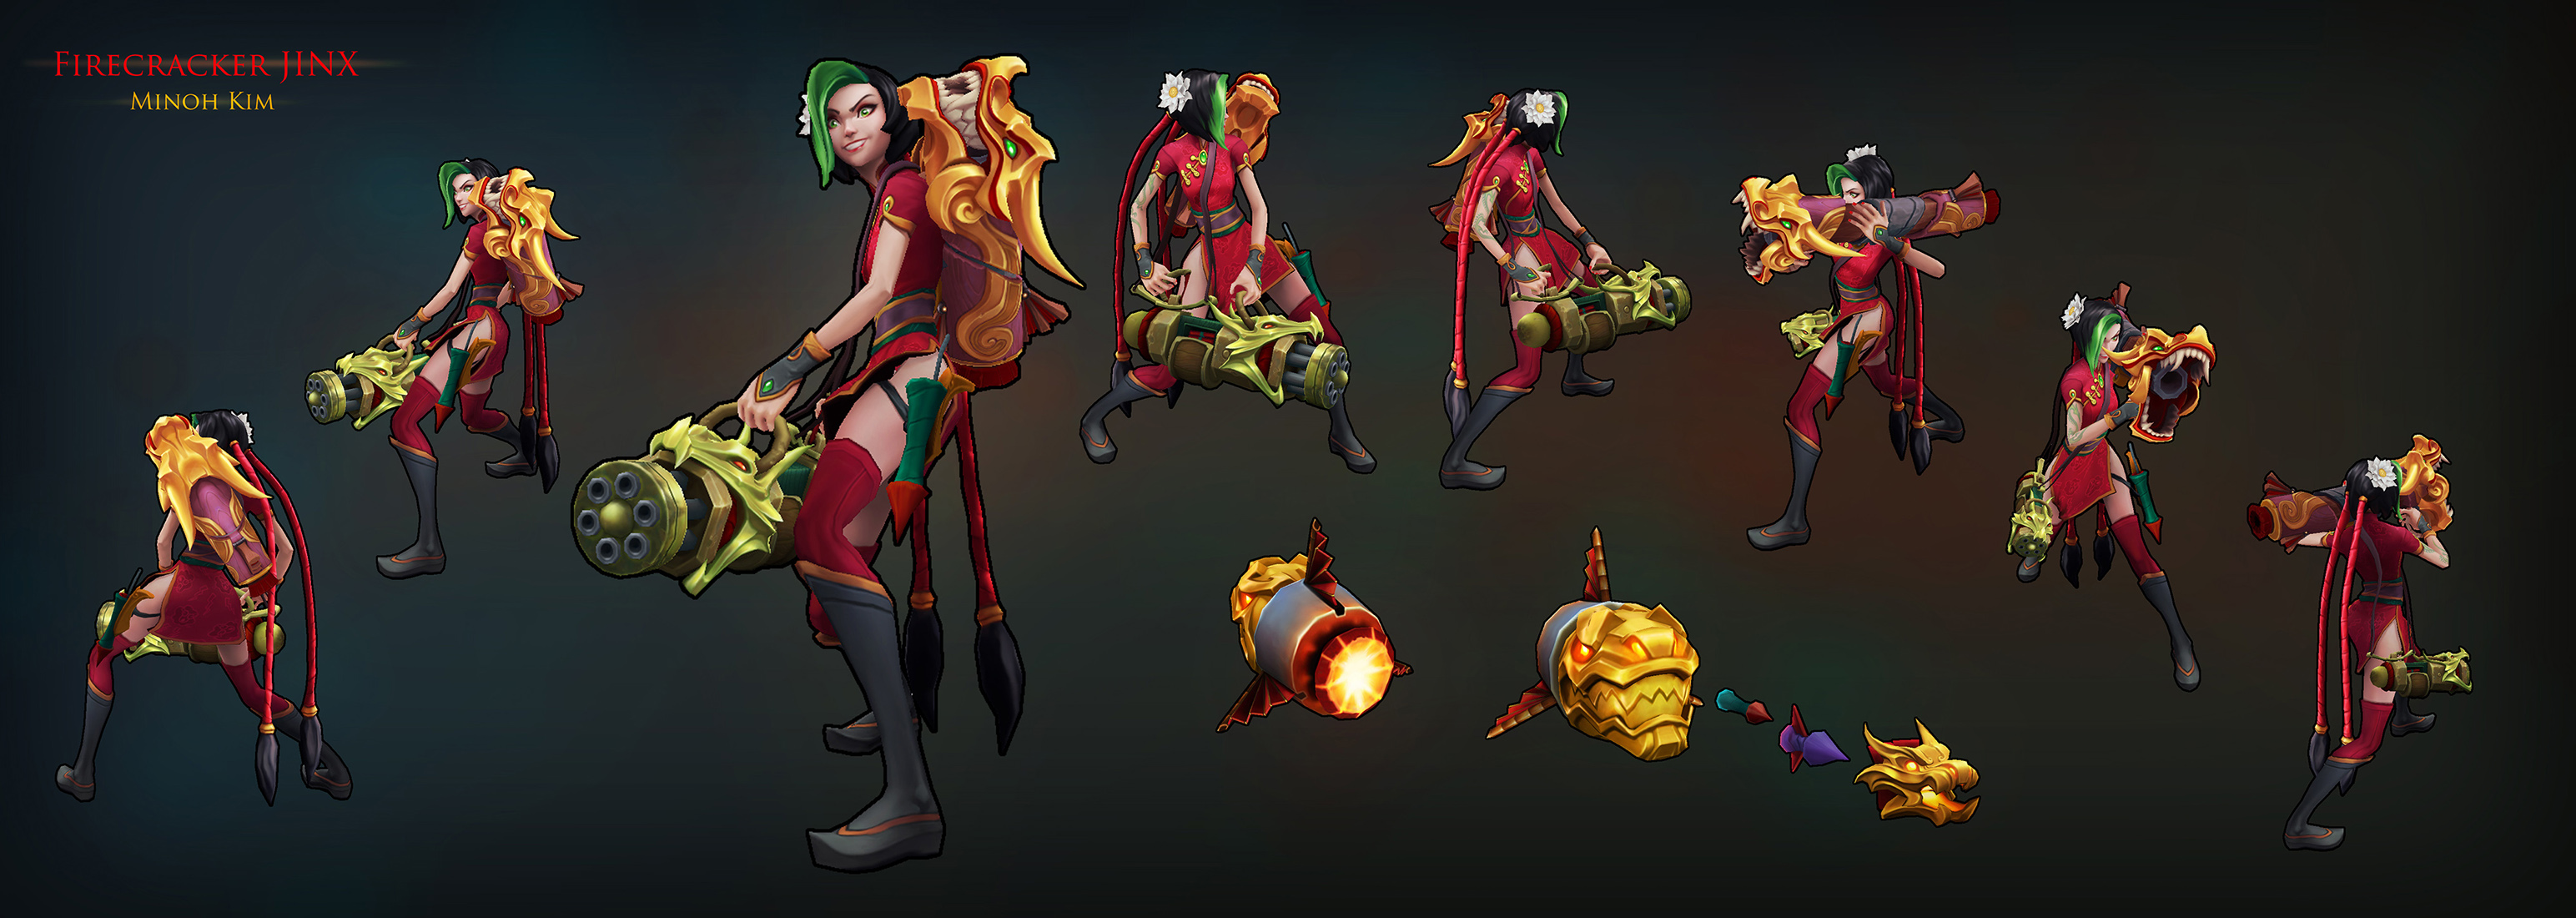 League of Legends - Firecracker Jinx skin by MinohKim